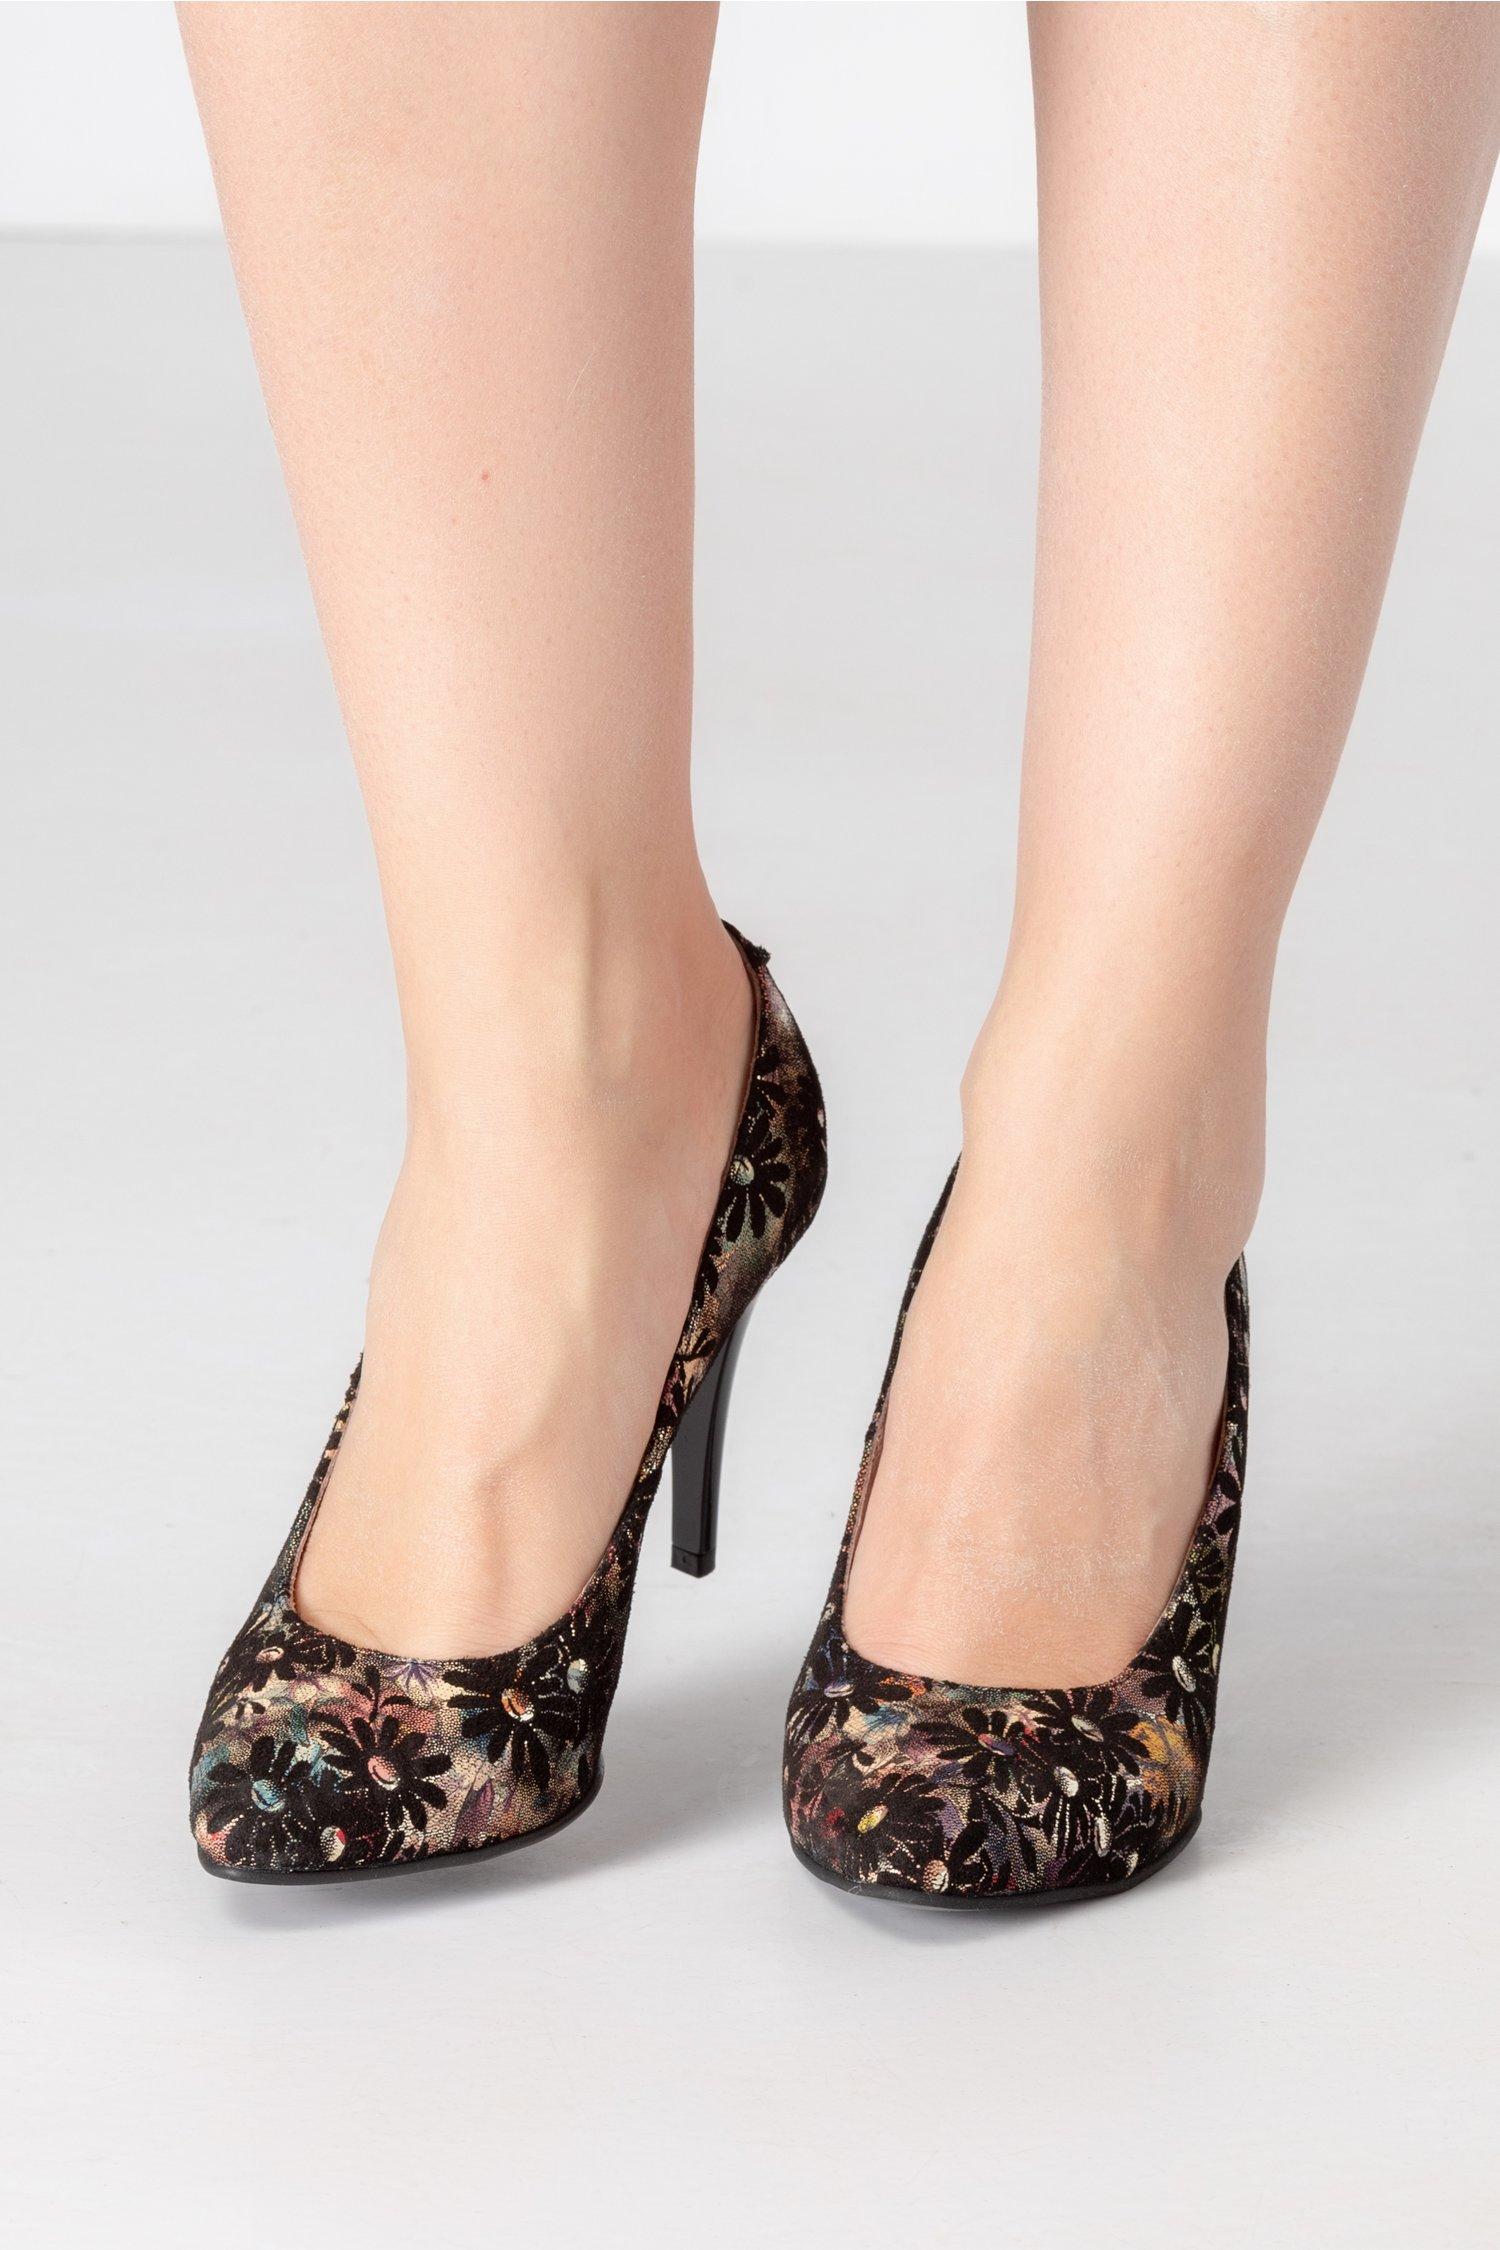 Pantofi stiletto cu imprimeu floral si detalii aurii